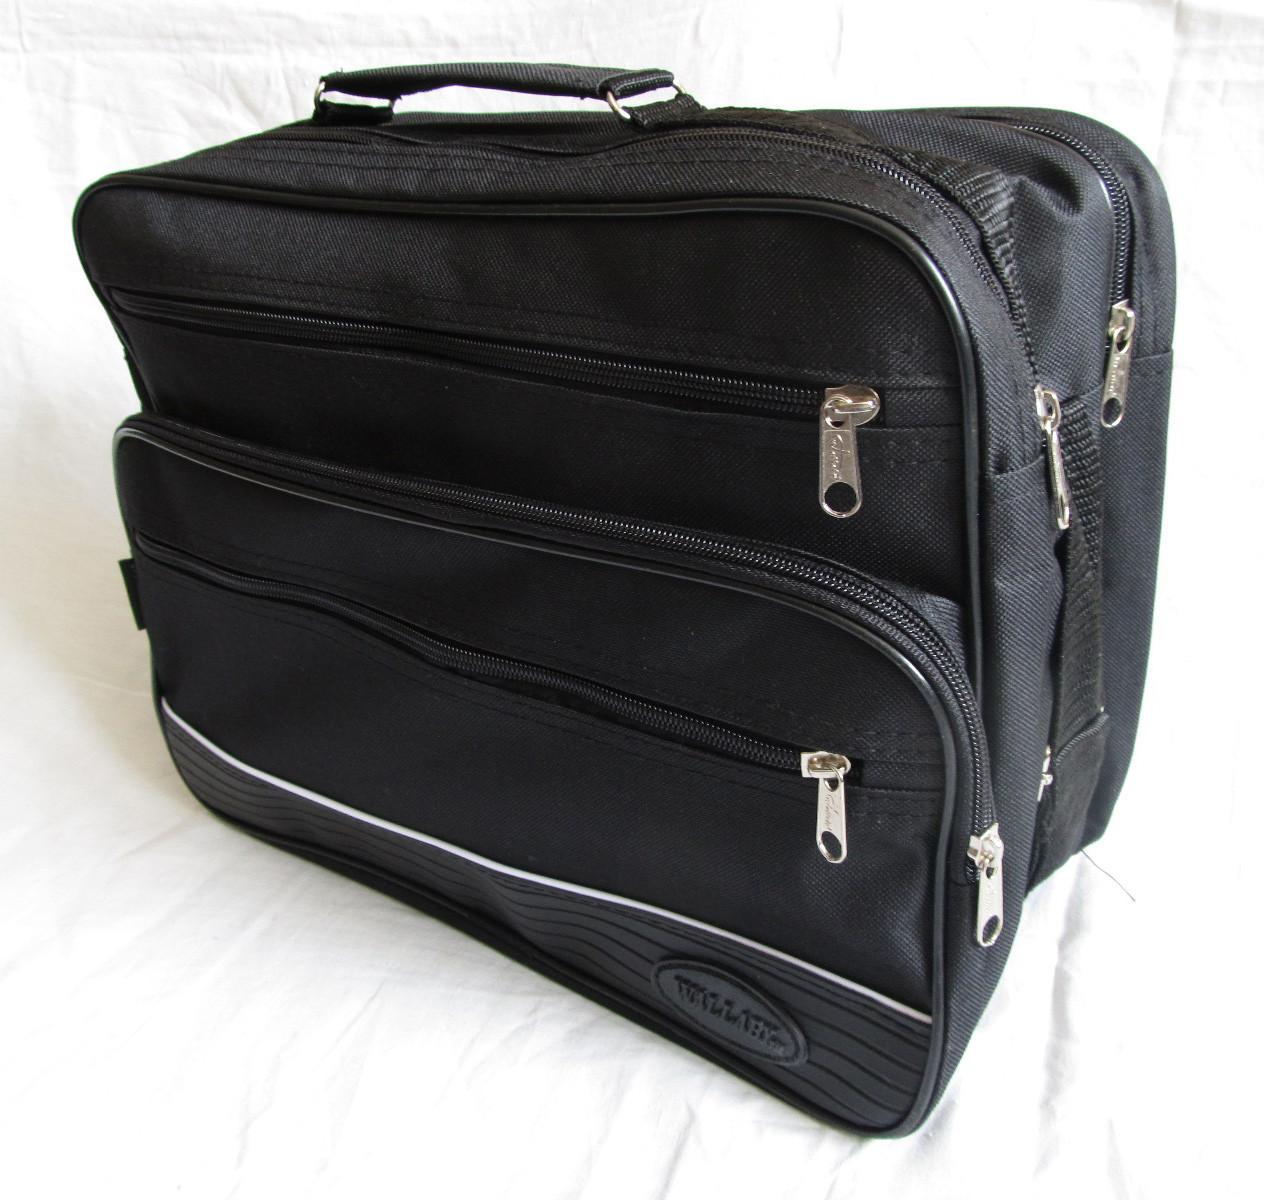 e7a0b18d60d0 Мужская сумка Wallaby 2650 черная барсетка через плечо папка портфель А4  35х26х17см